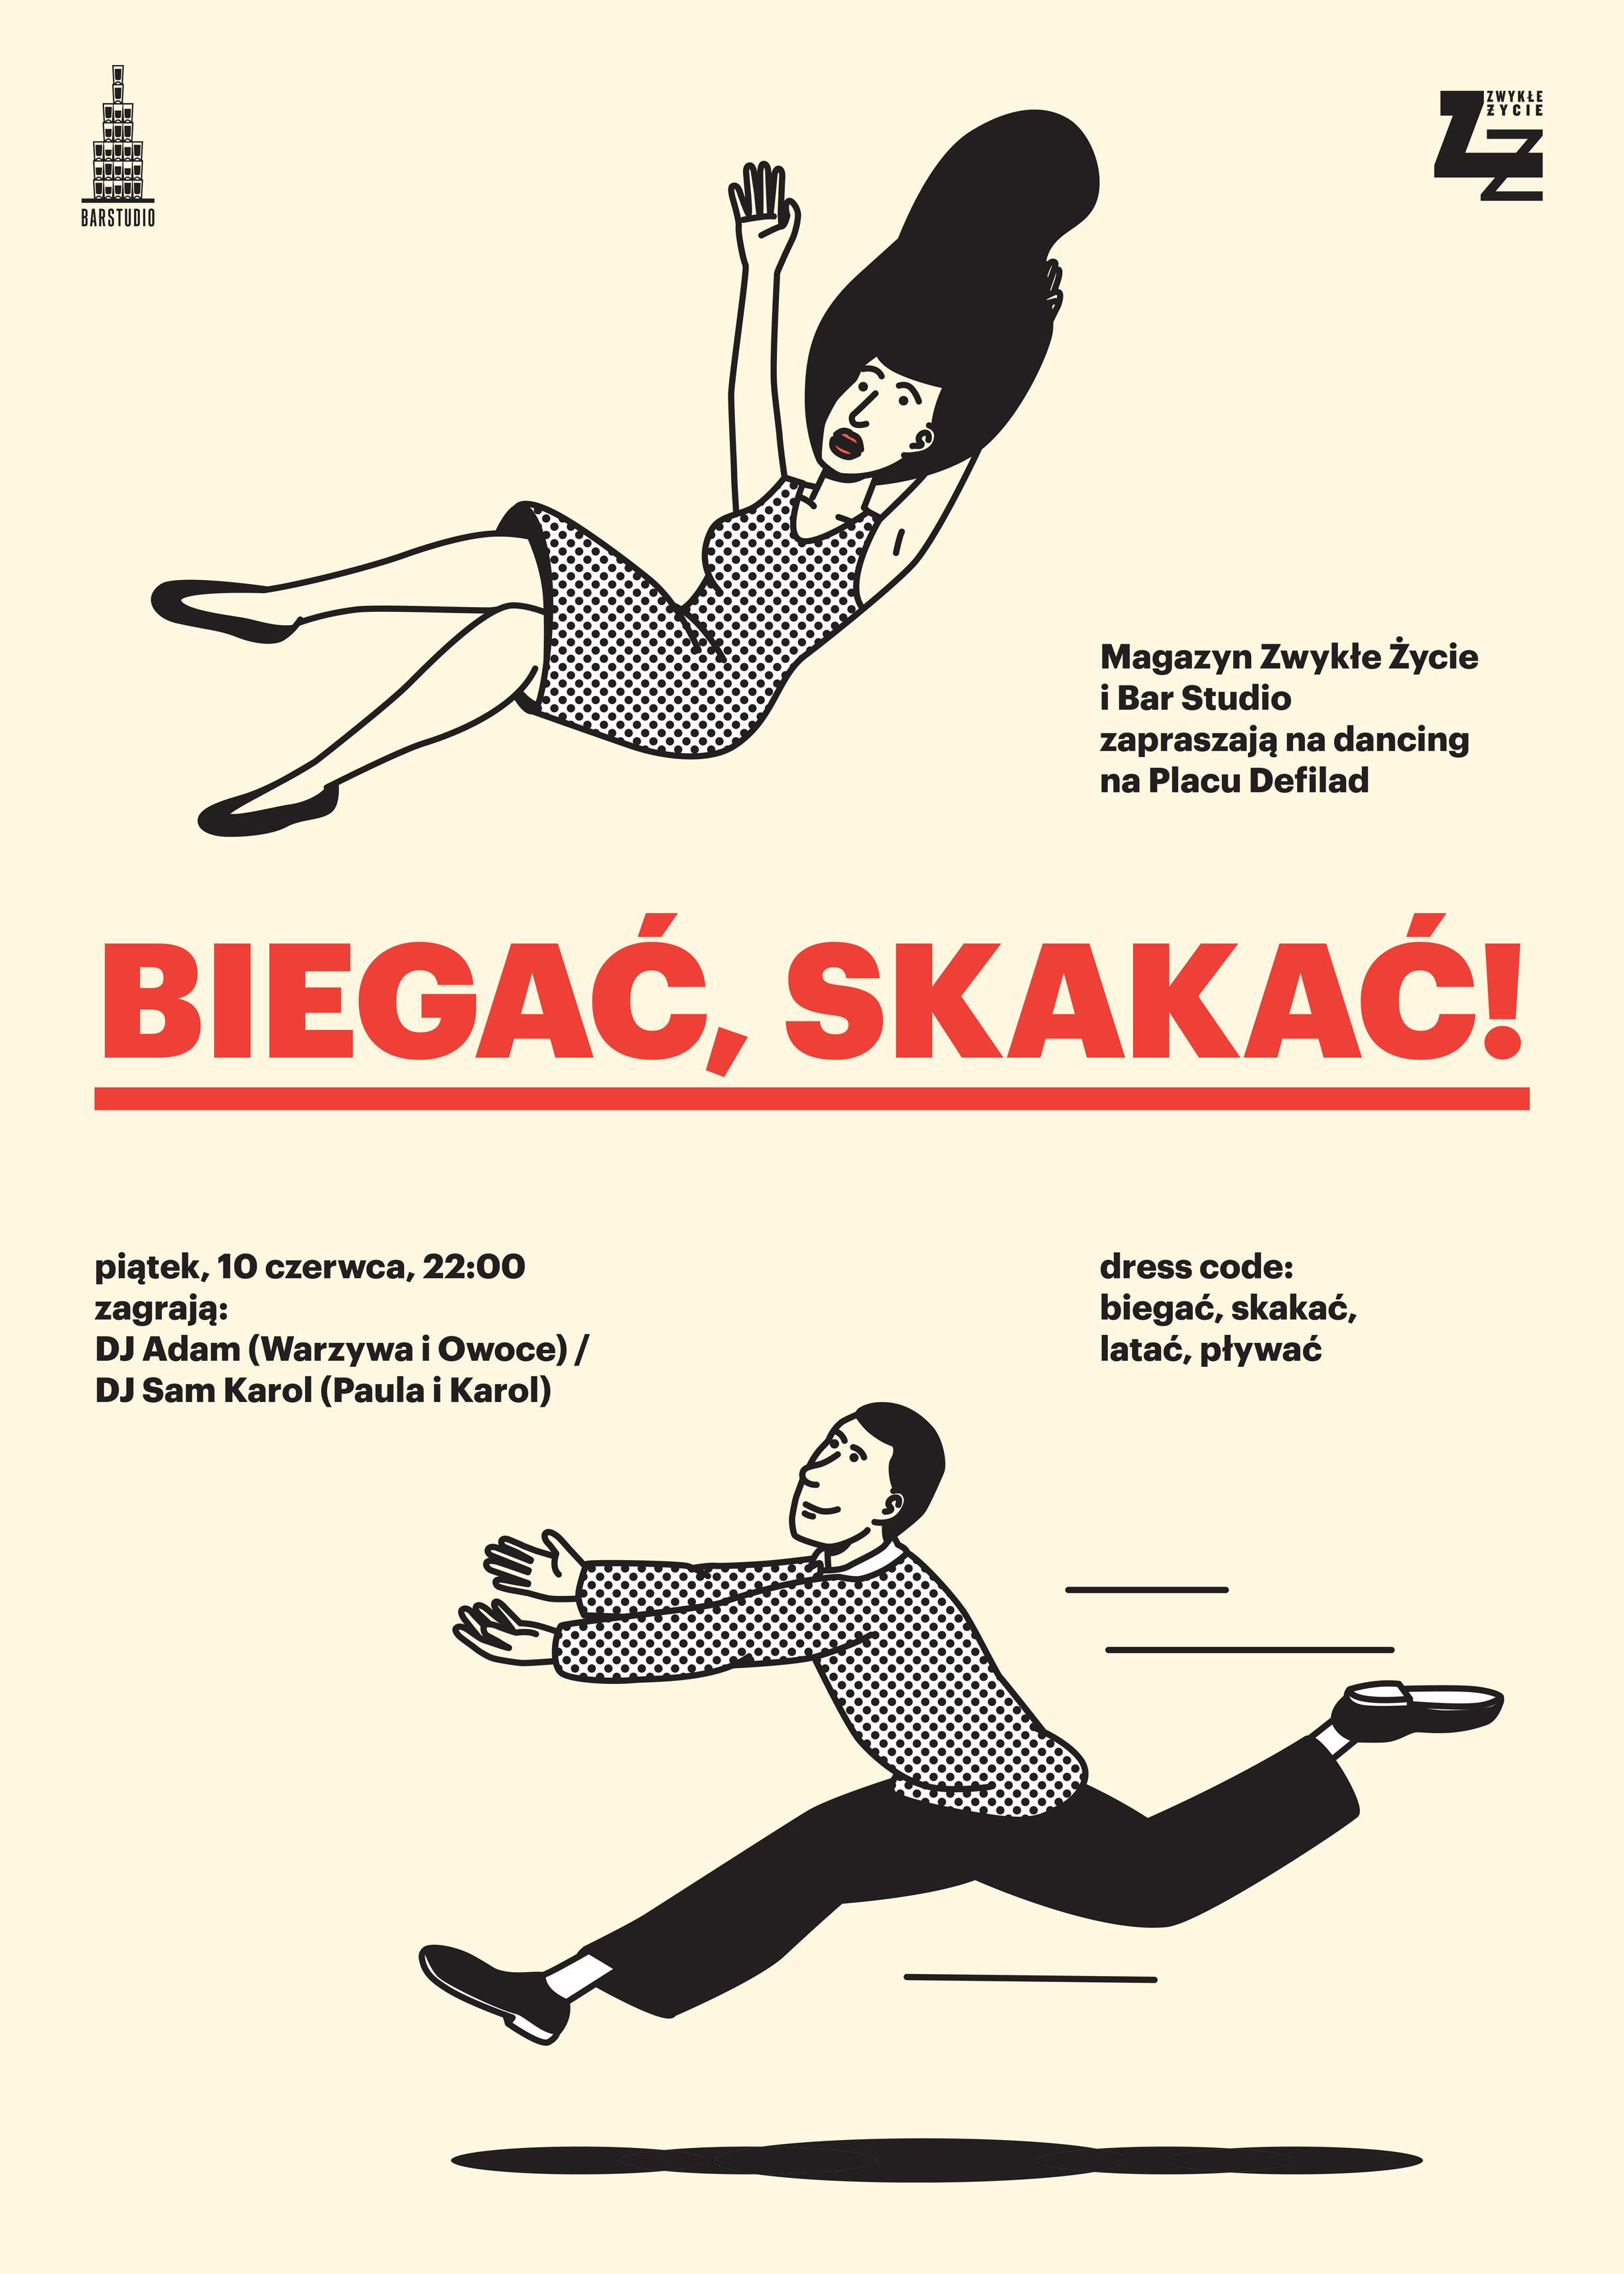 biegac_skakac_web (2)